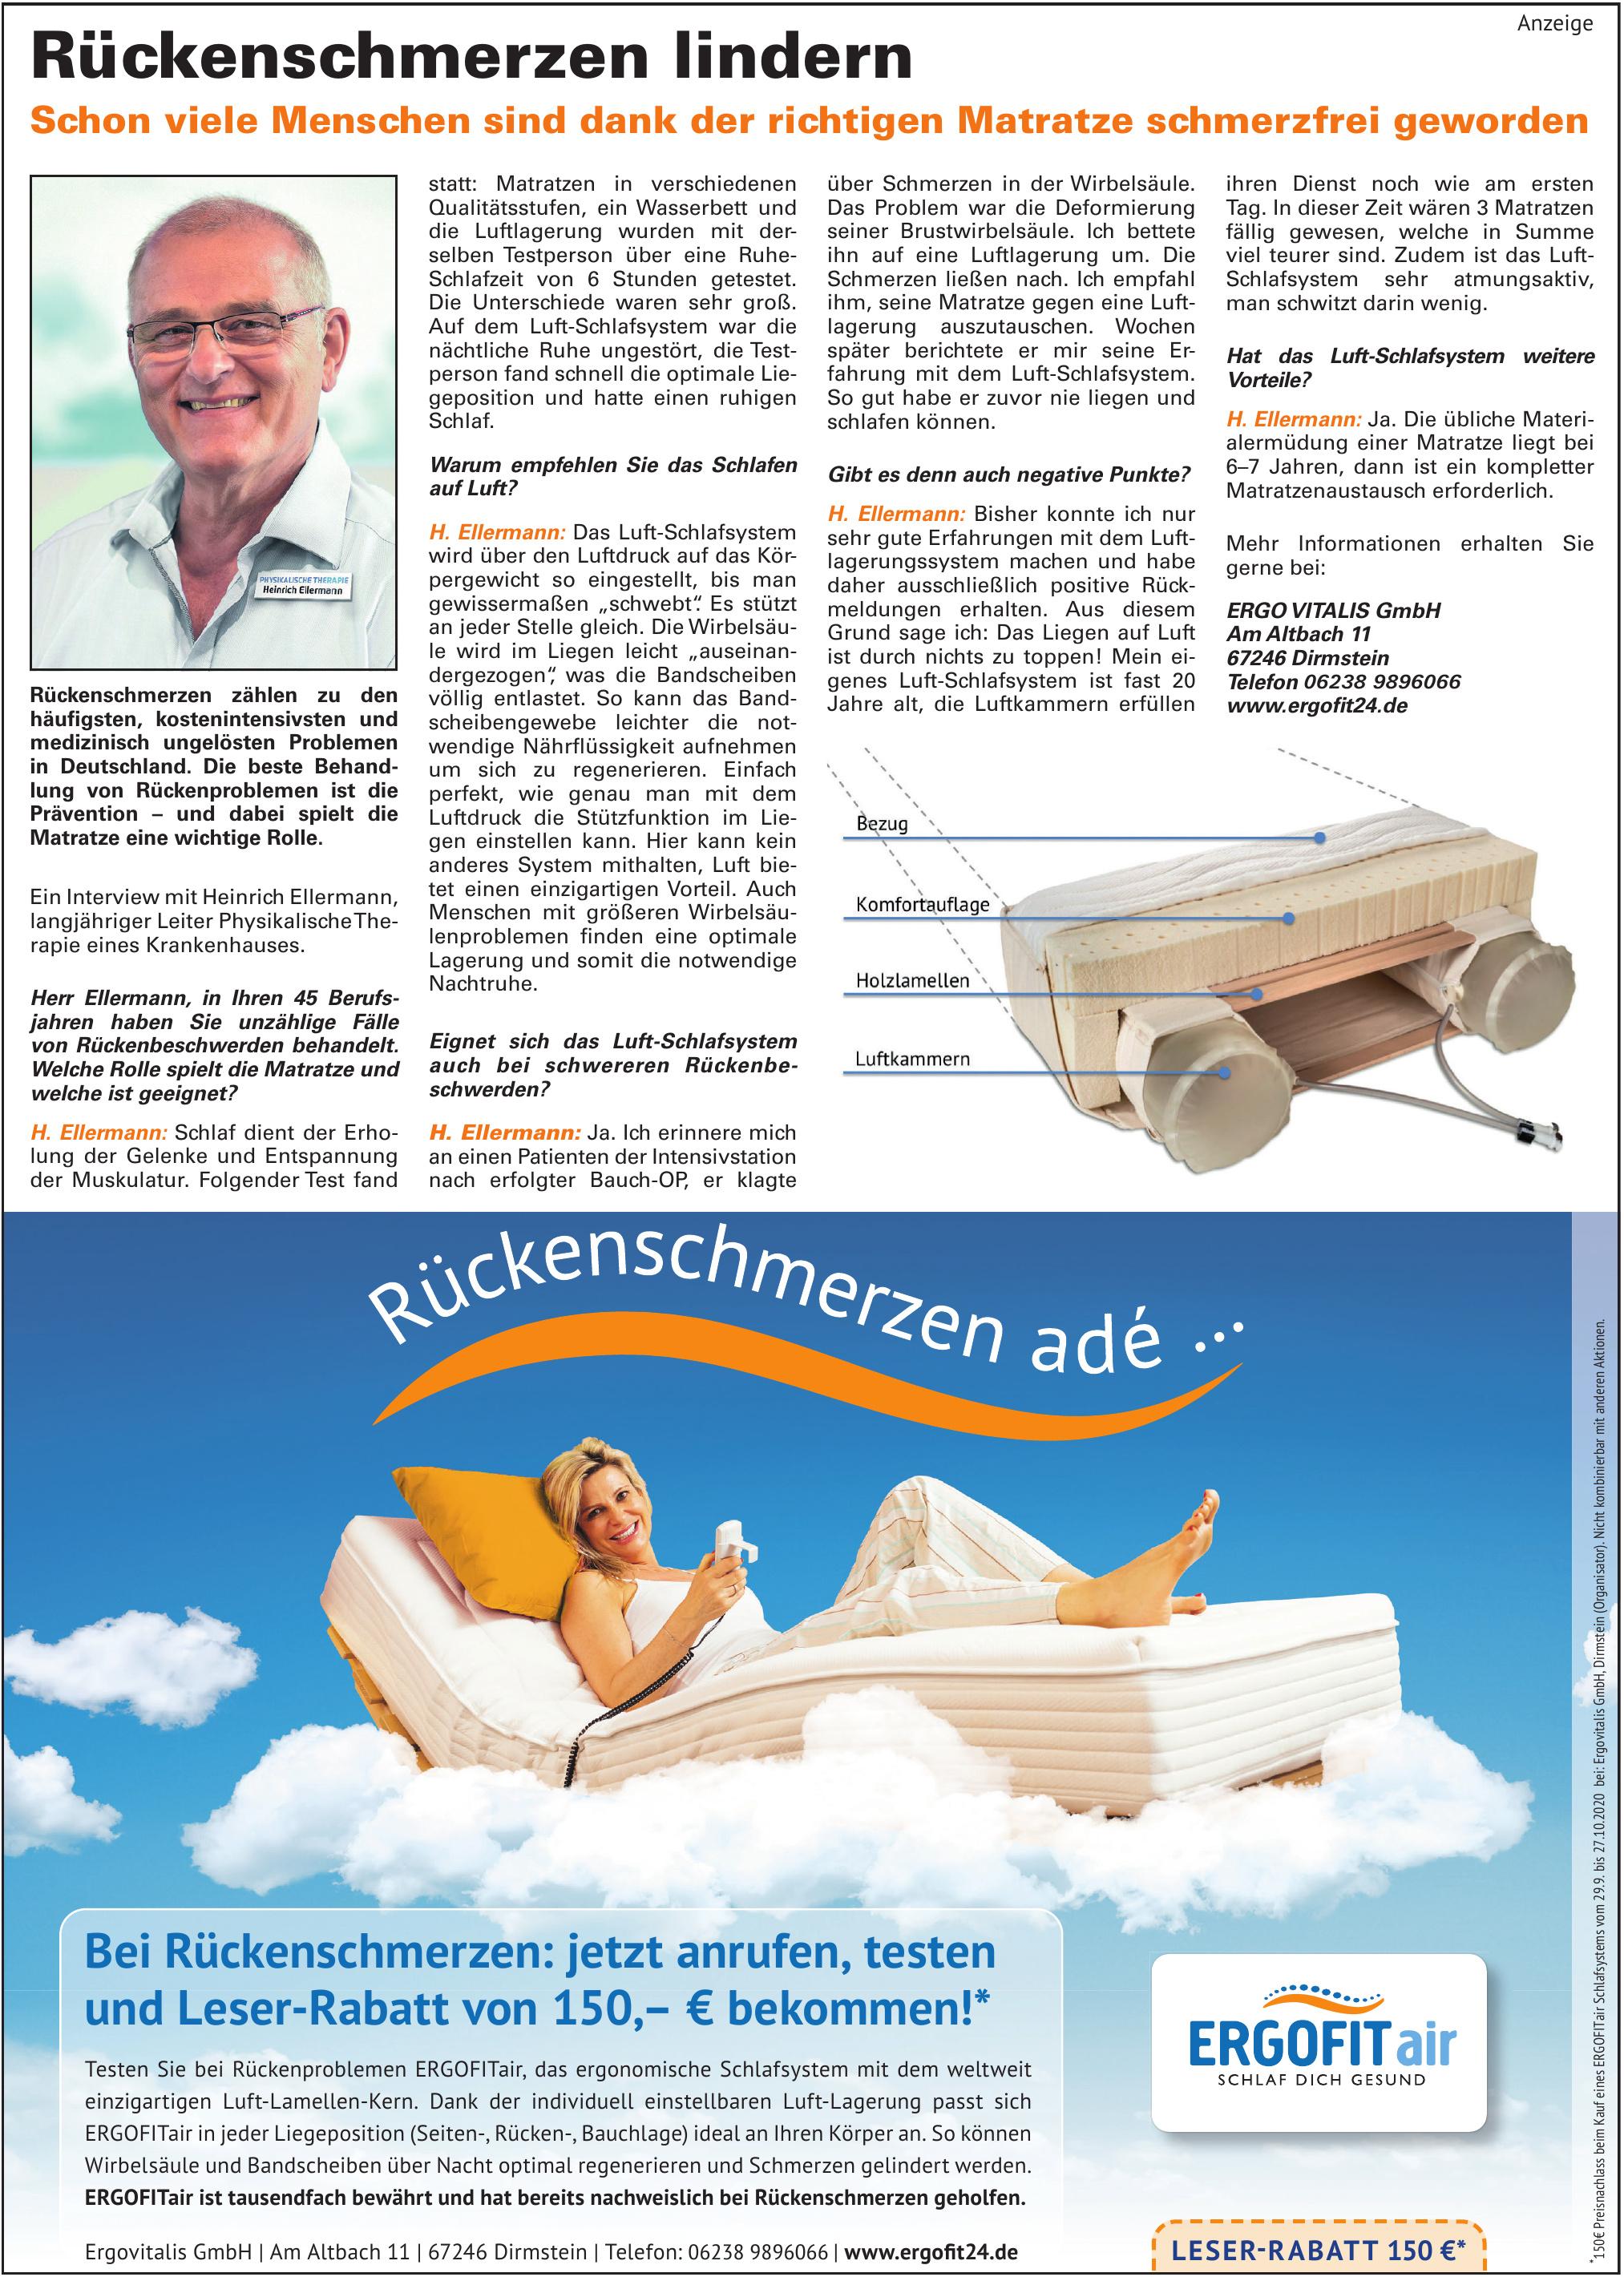 Ergovitalis GmbH